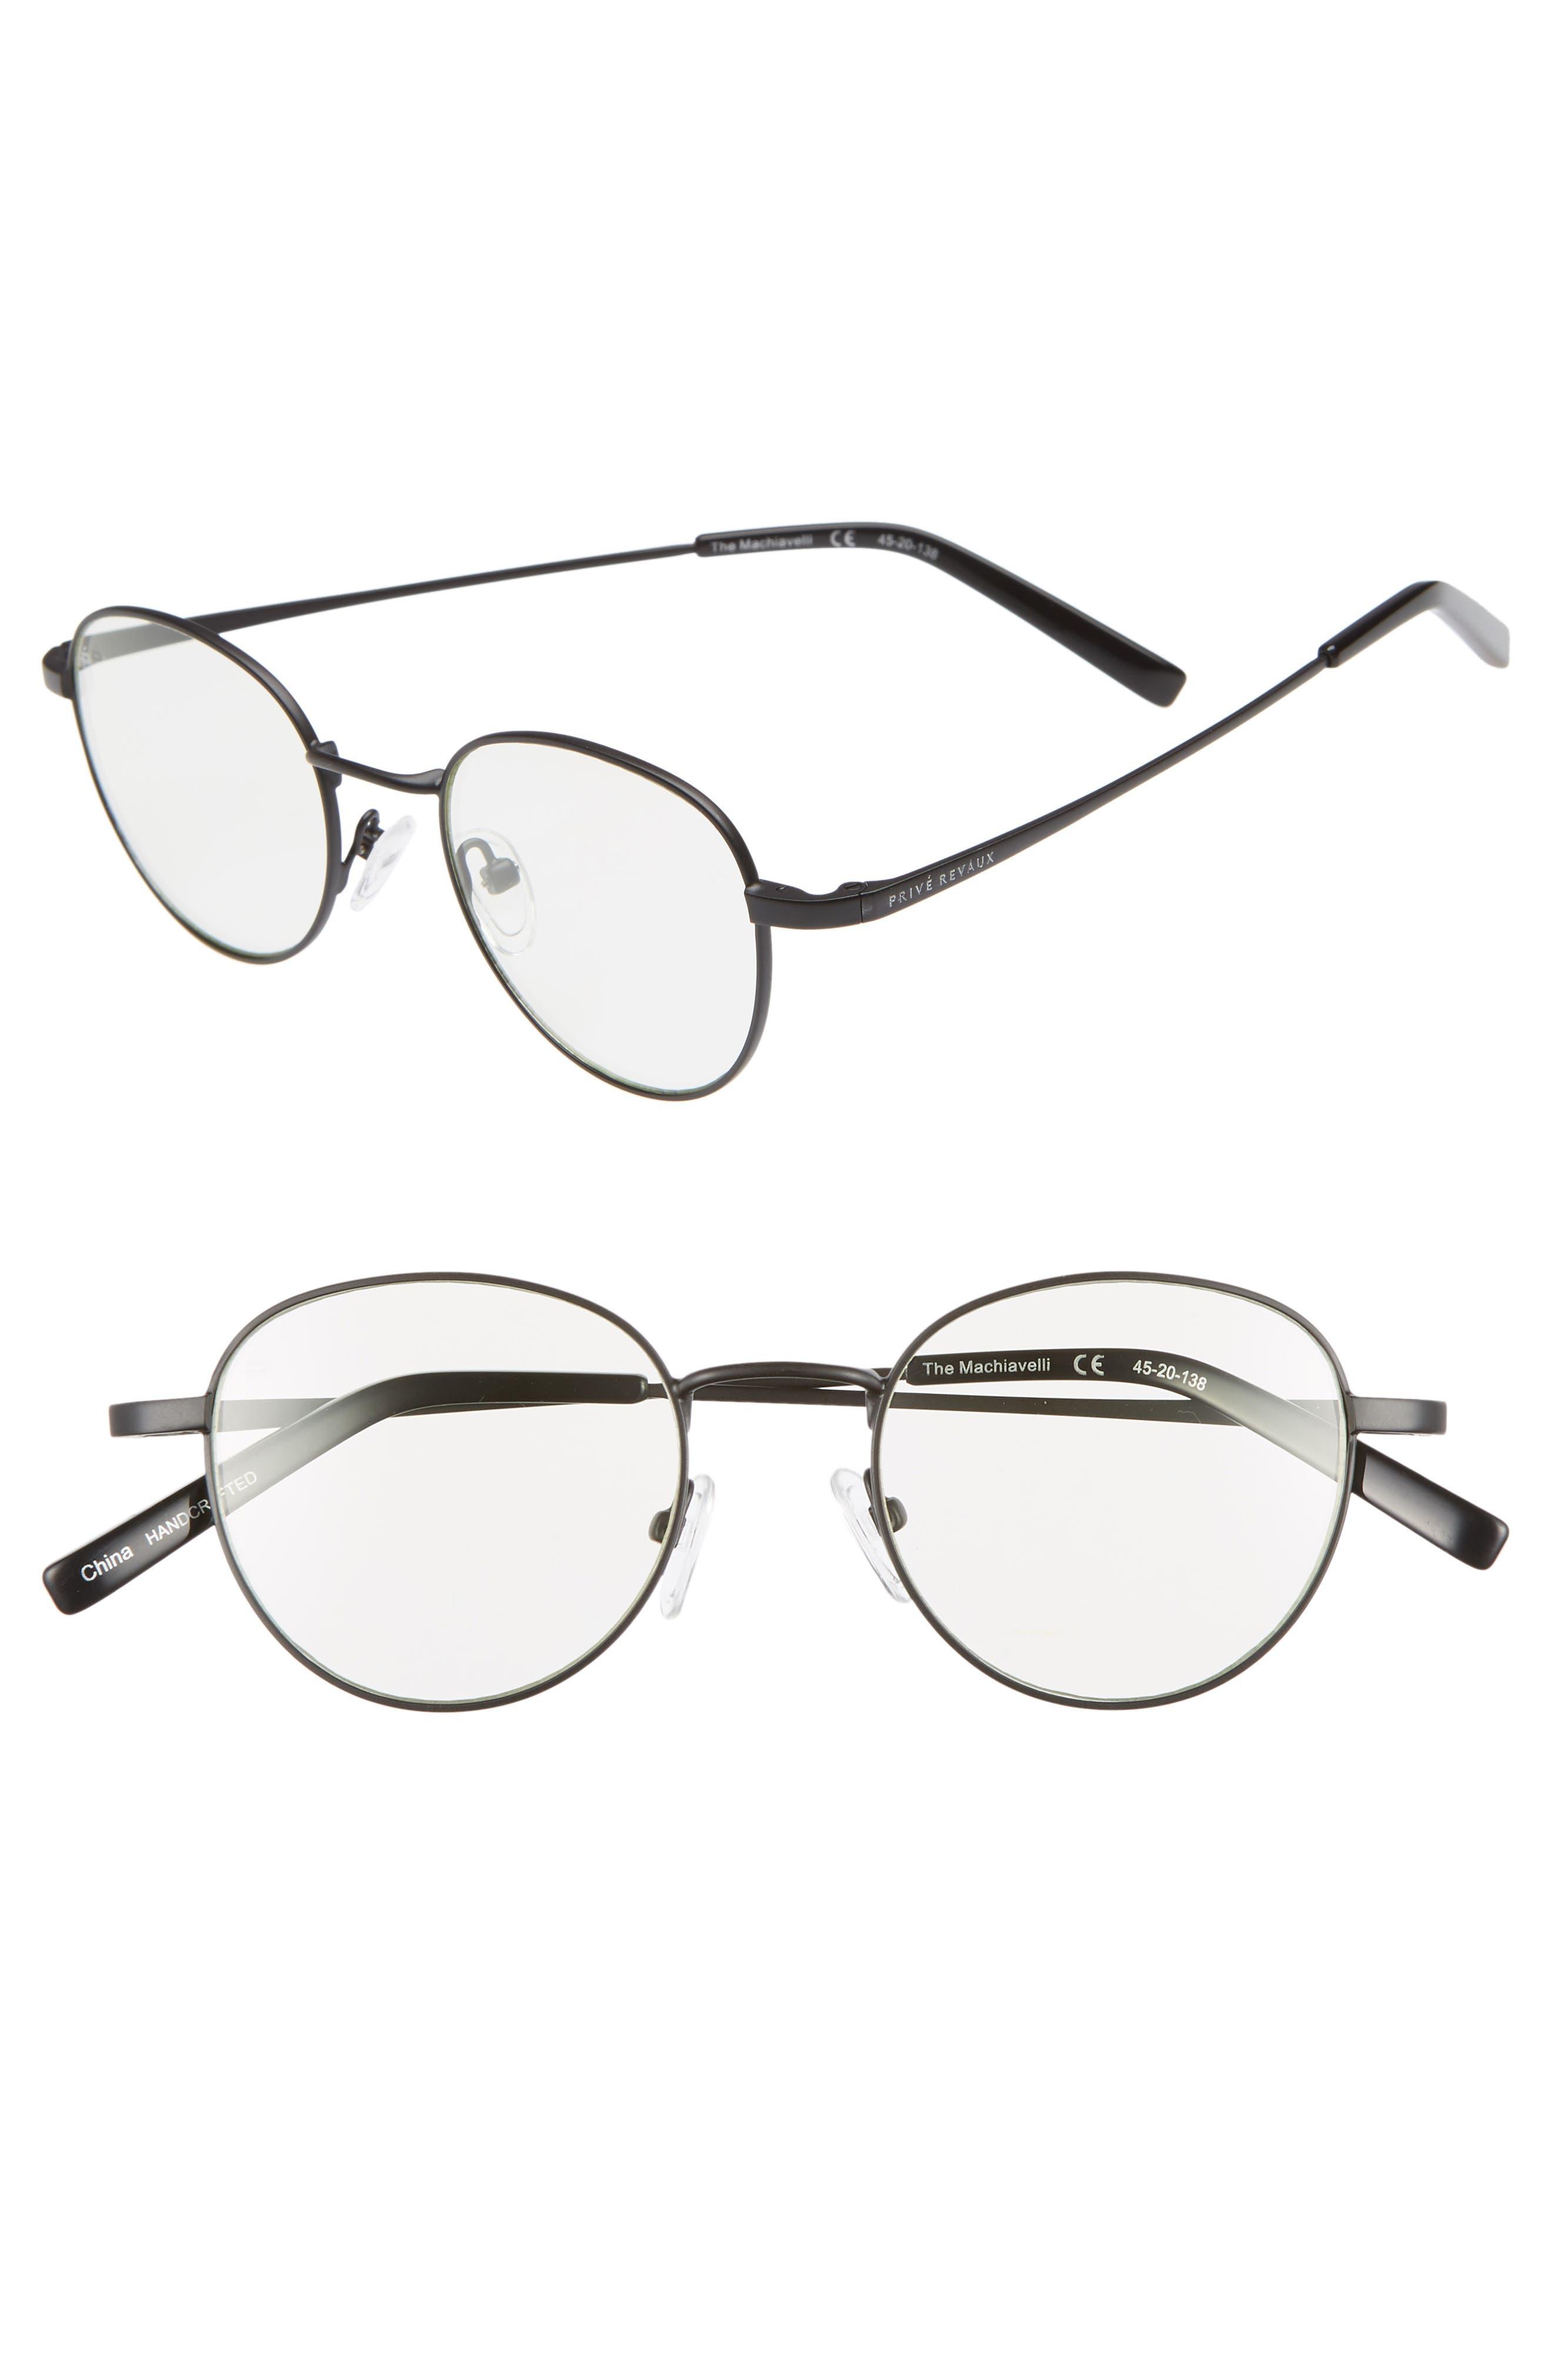 Privé Revaux The Machiavelli 45mm Blue Light Blocking Glasses,                         Main,                         color,